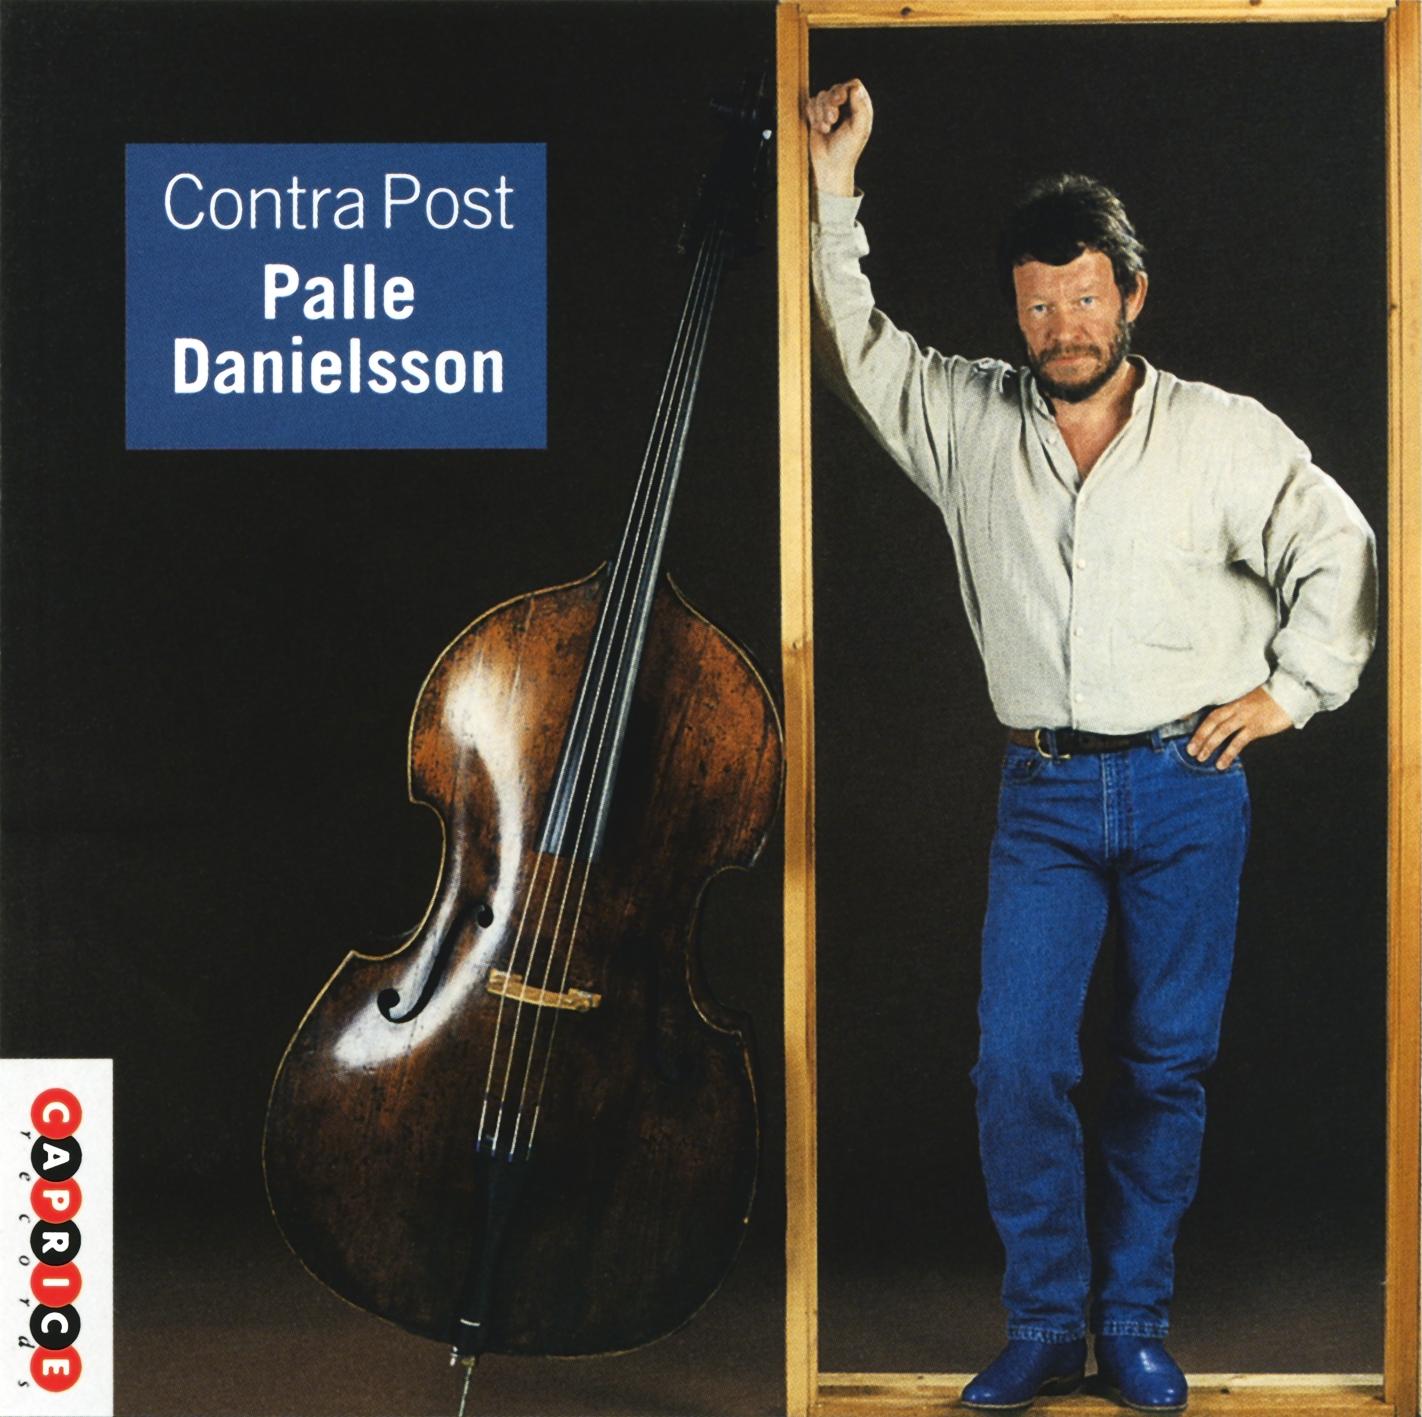 Palle Danielsson Contra Post